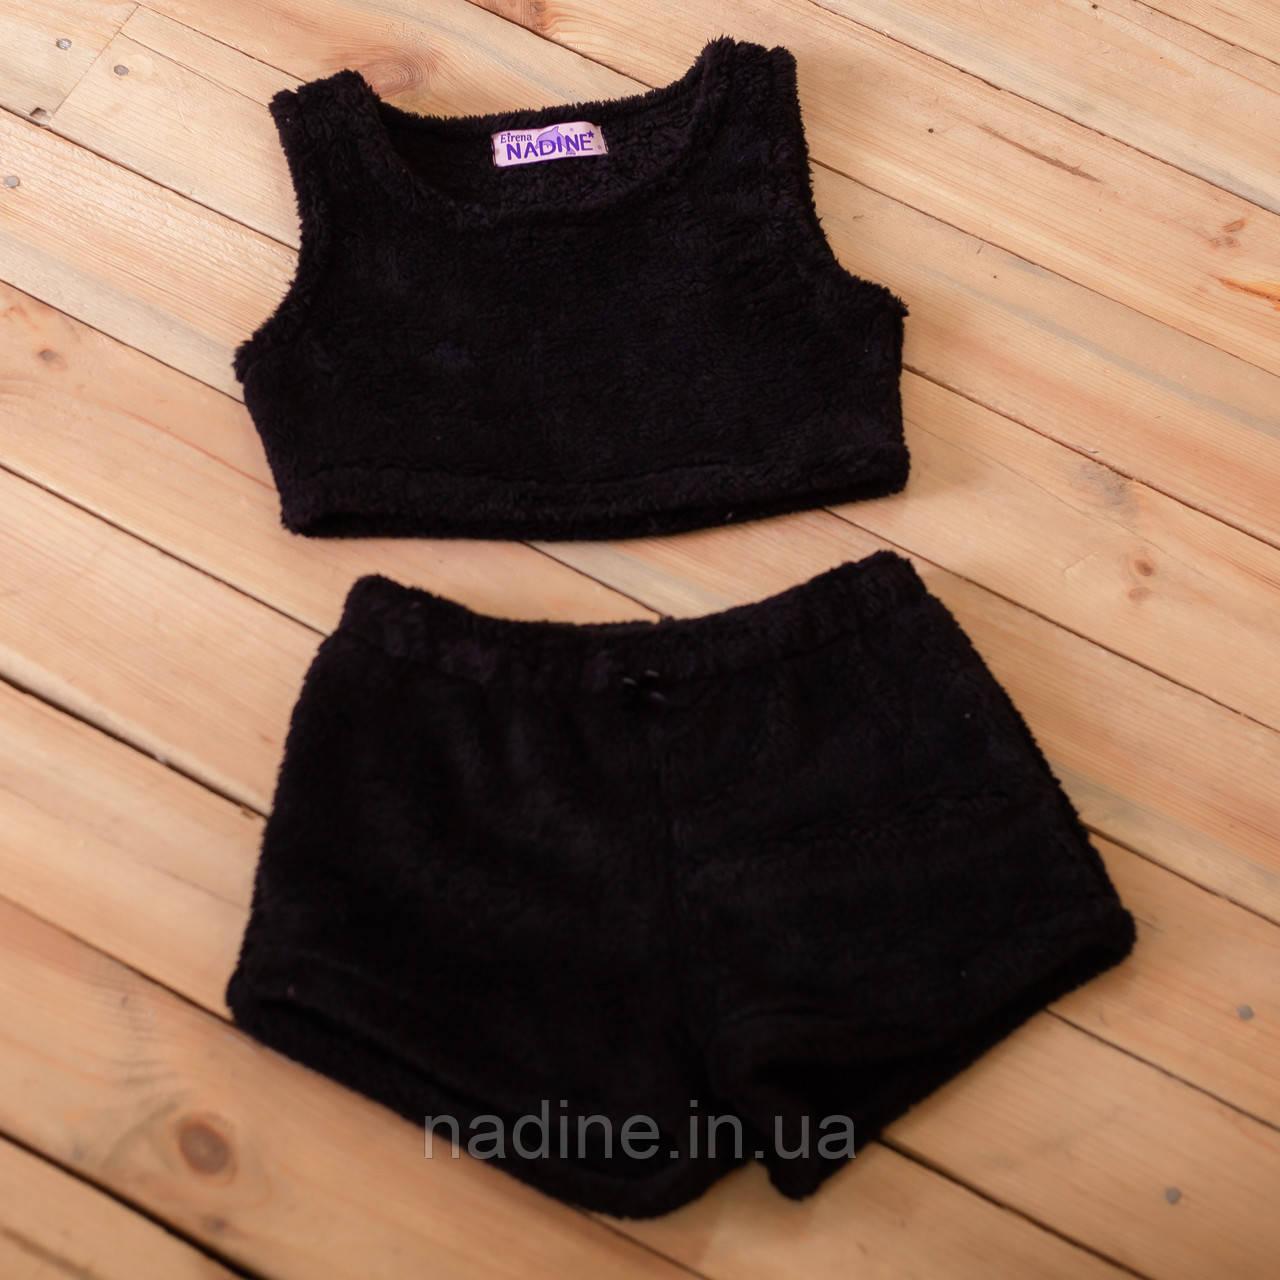 "Піжама топ +шорти ""Black"" Eirena Nadine (774-58) чорна на зріст 158"